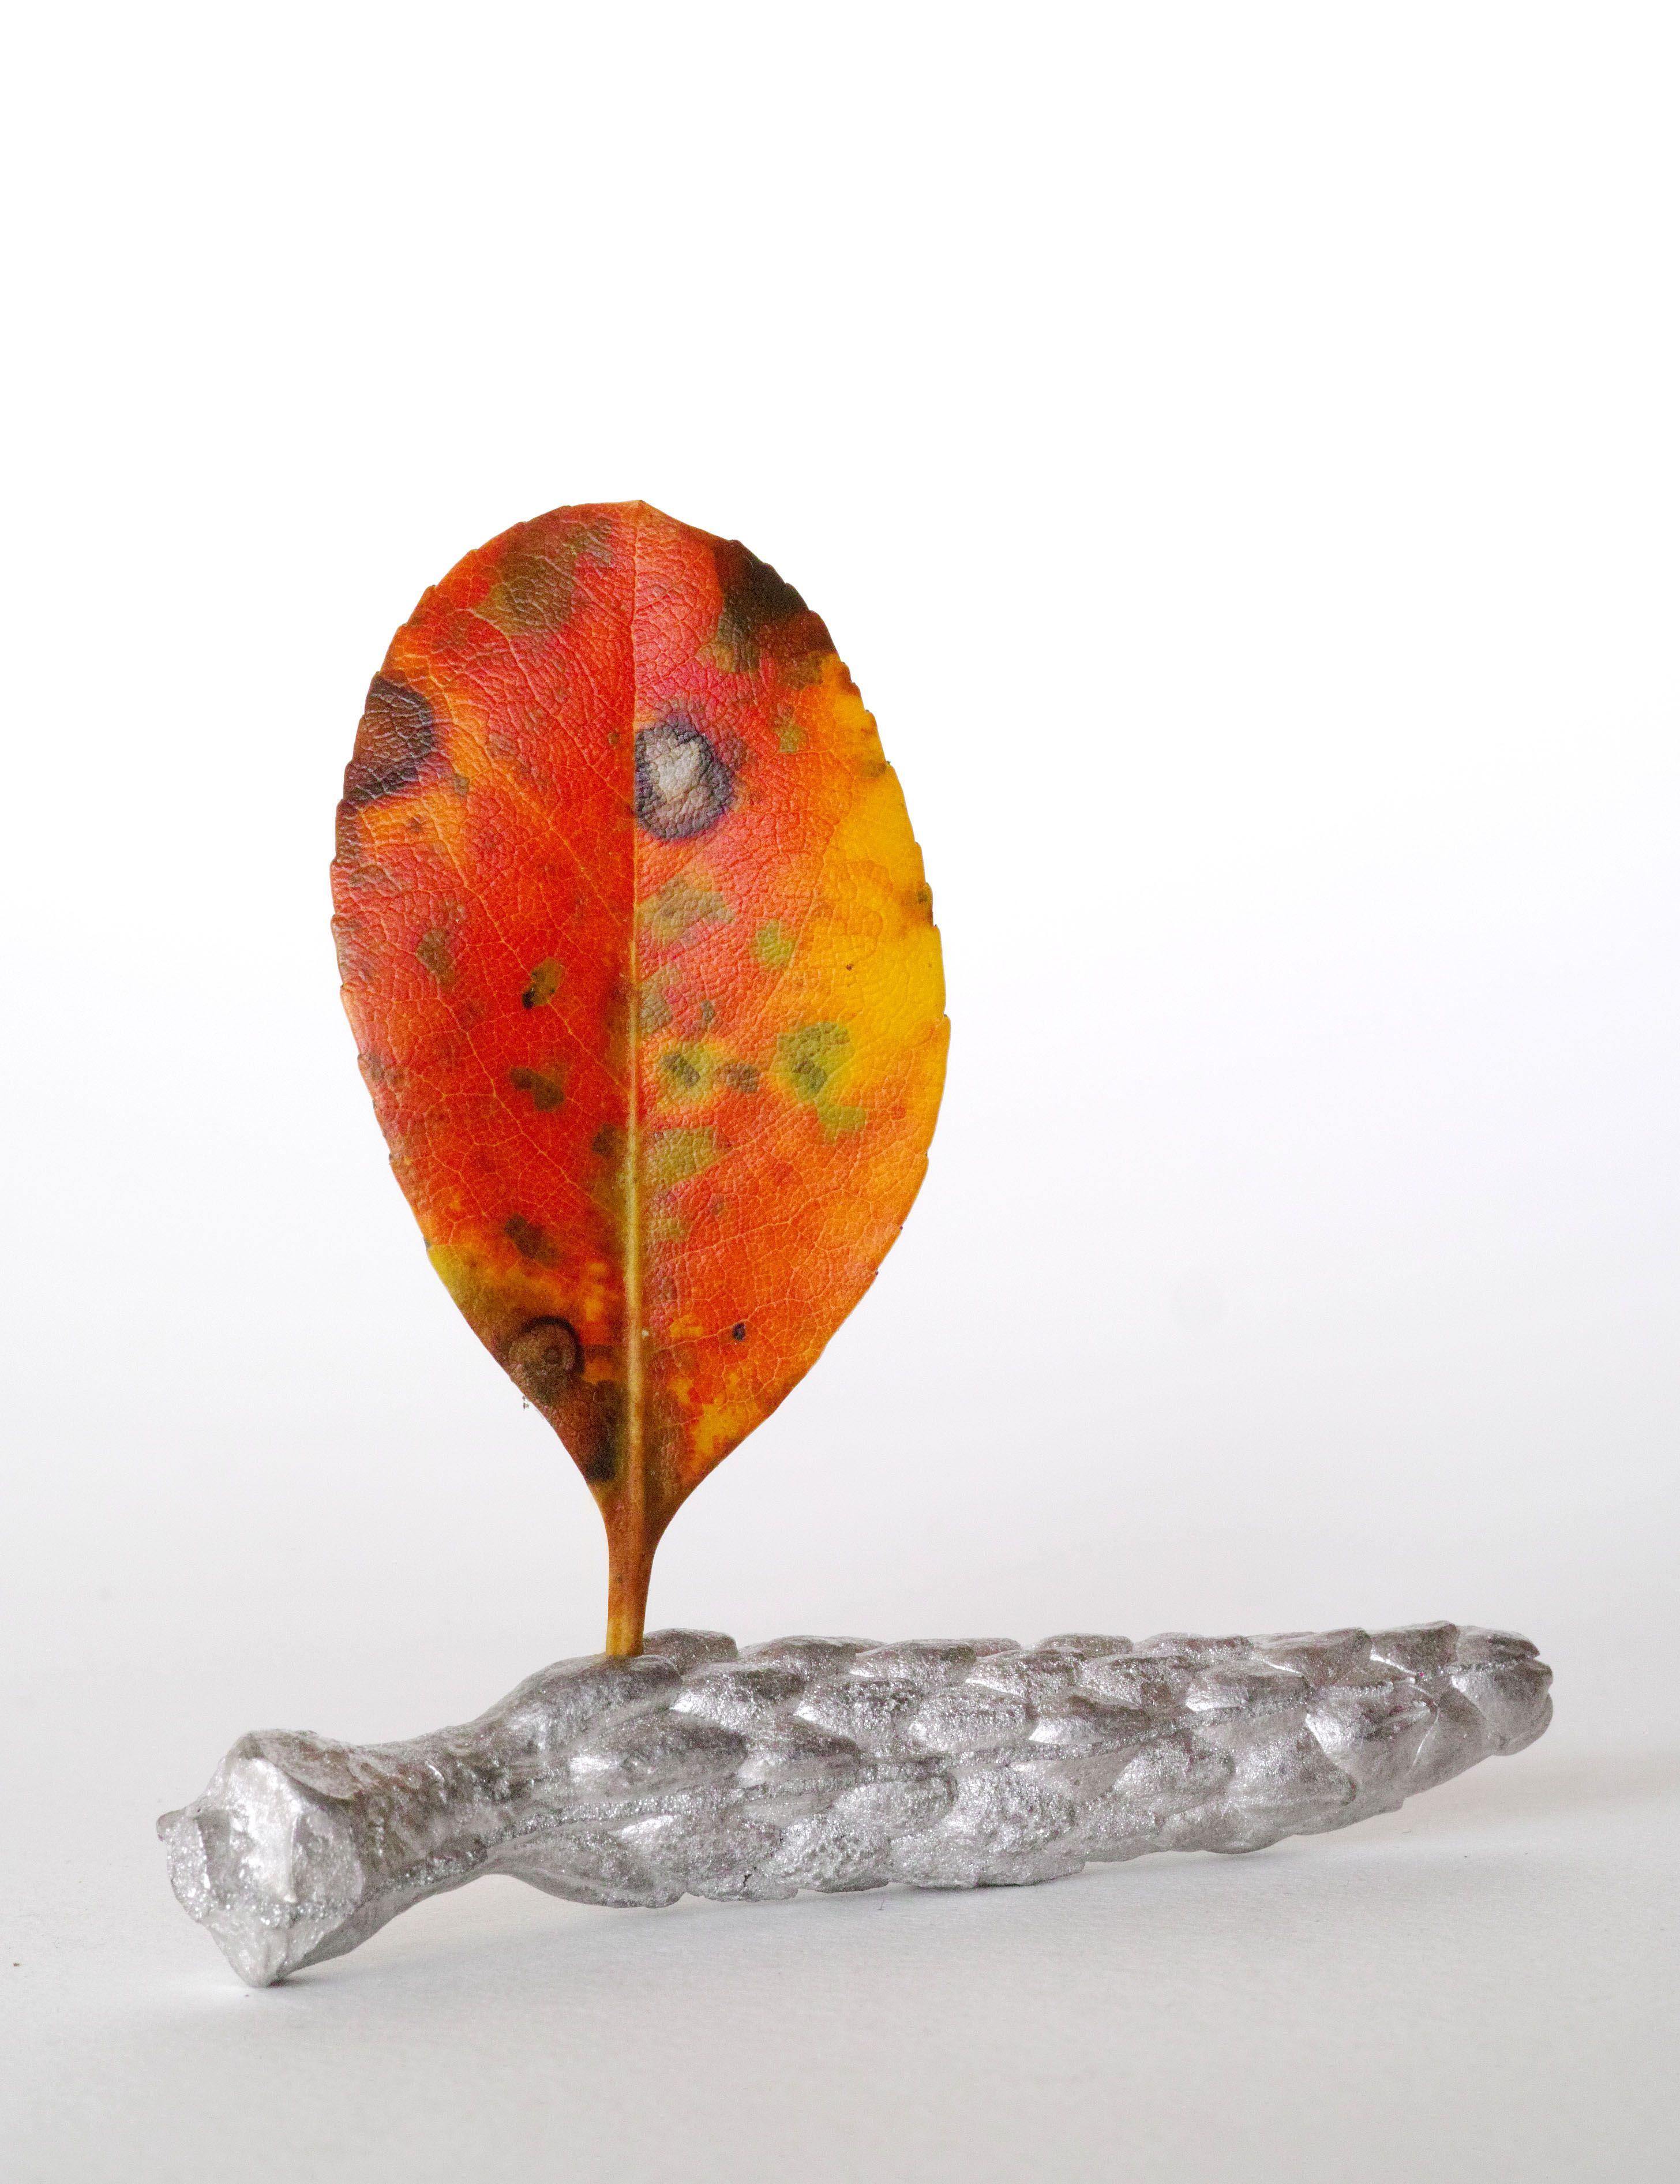 ikebana ikebanagii  Ryuichi Nagira 2016/03/30 車輪梅(シャリンバイ)+木蓮(モクレン)のタネ(スズ鋳物)  : Rhaphiolepis indica var. umbellate+ Seed of the Magnolia quinquepeta(Tin casting)